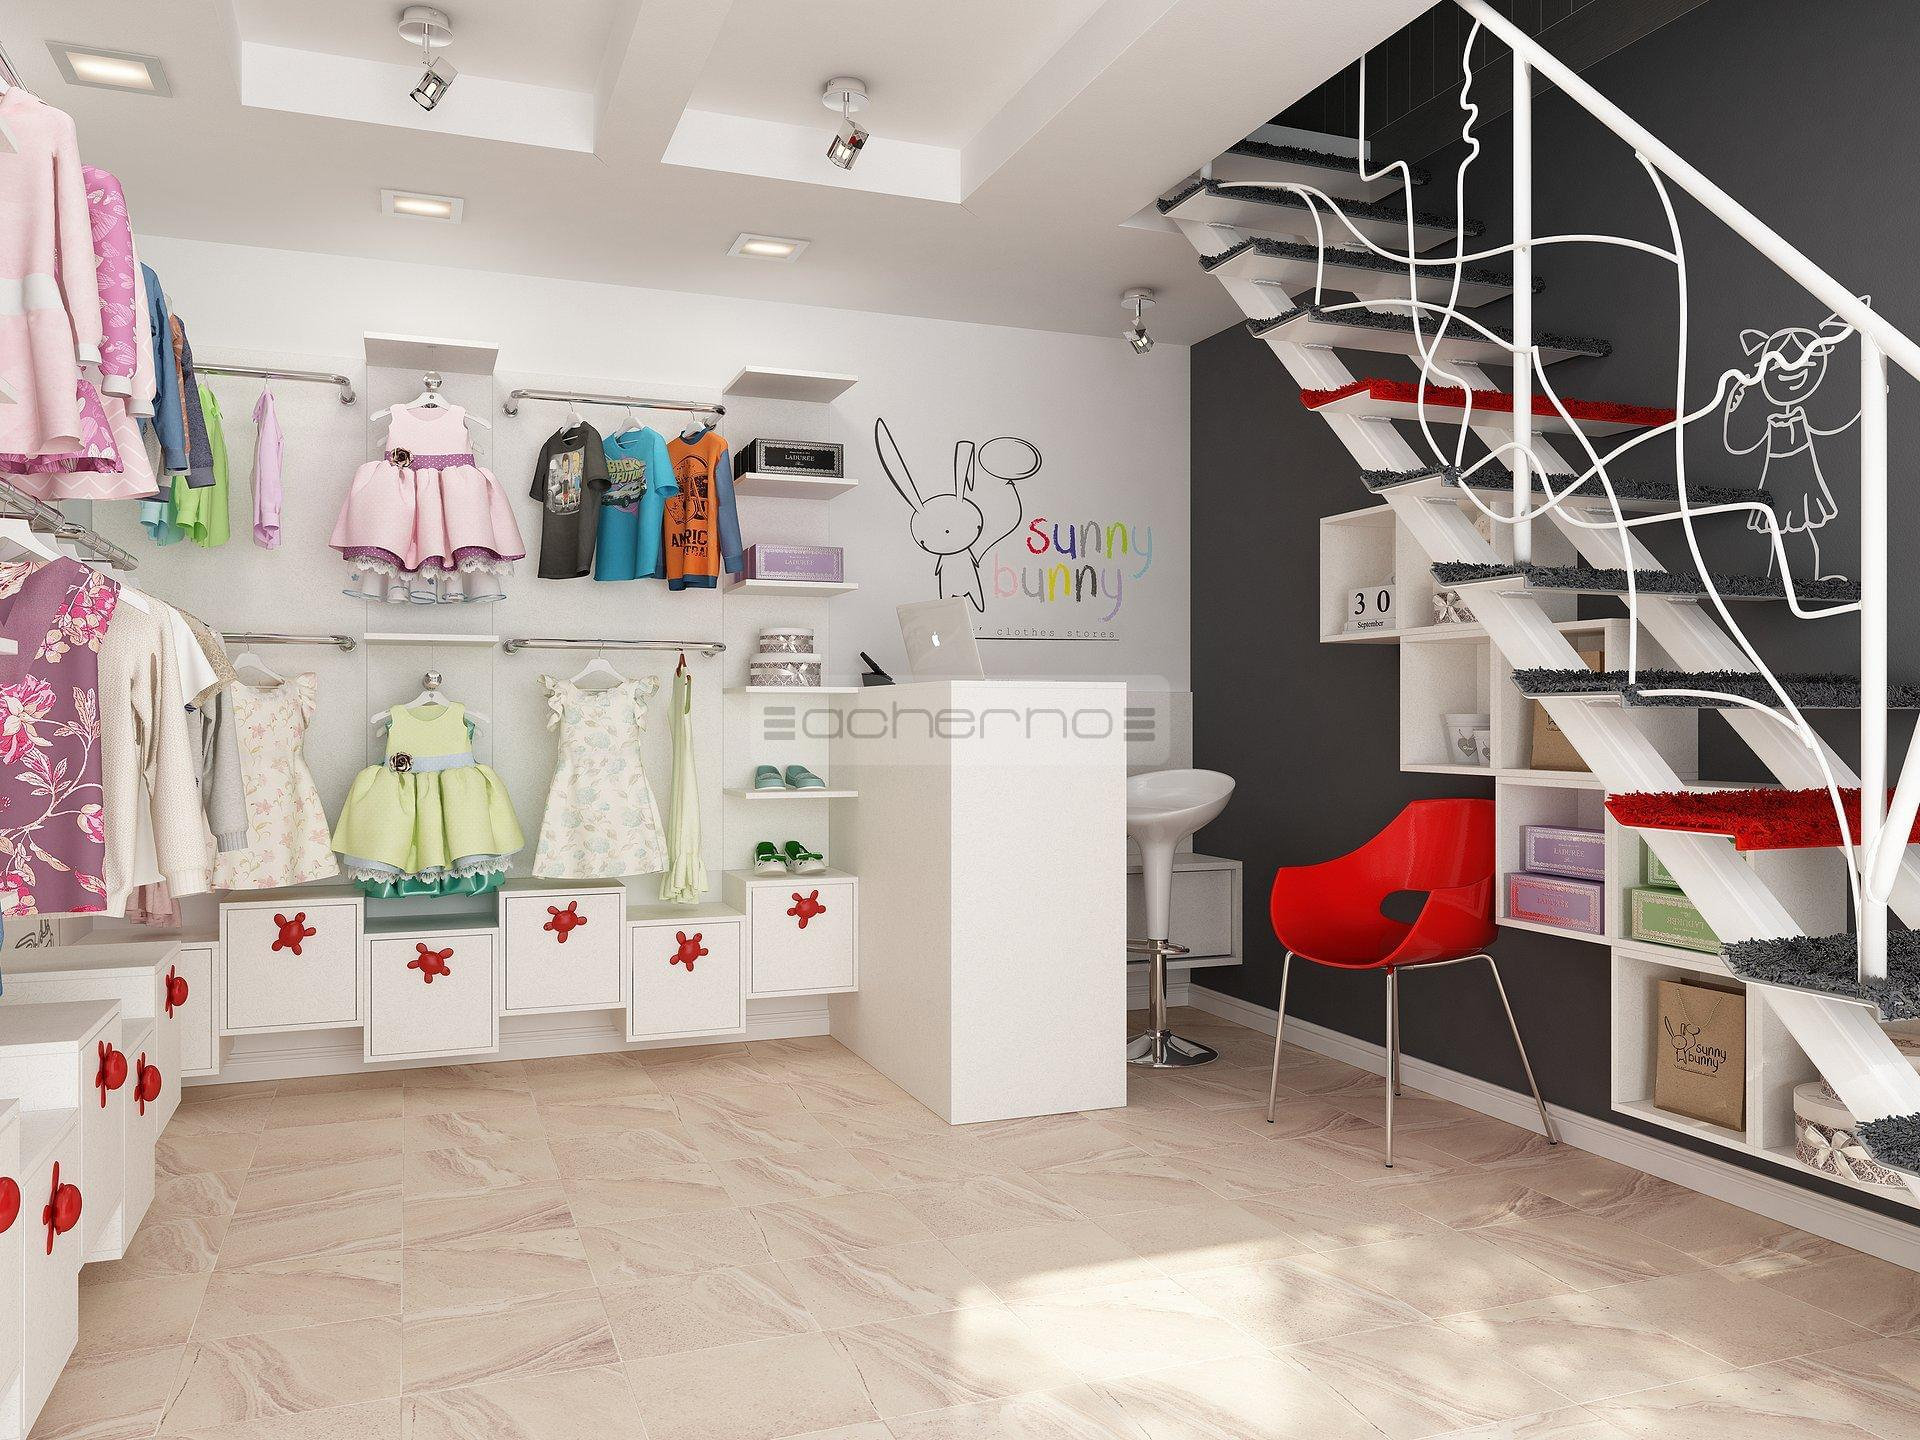 Acherno raumgestaltung kindermode boutique sunny bunny for Raumgestaltung cafe